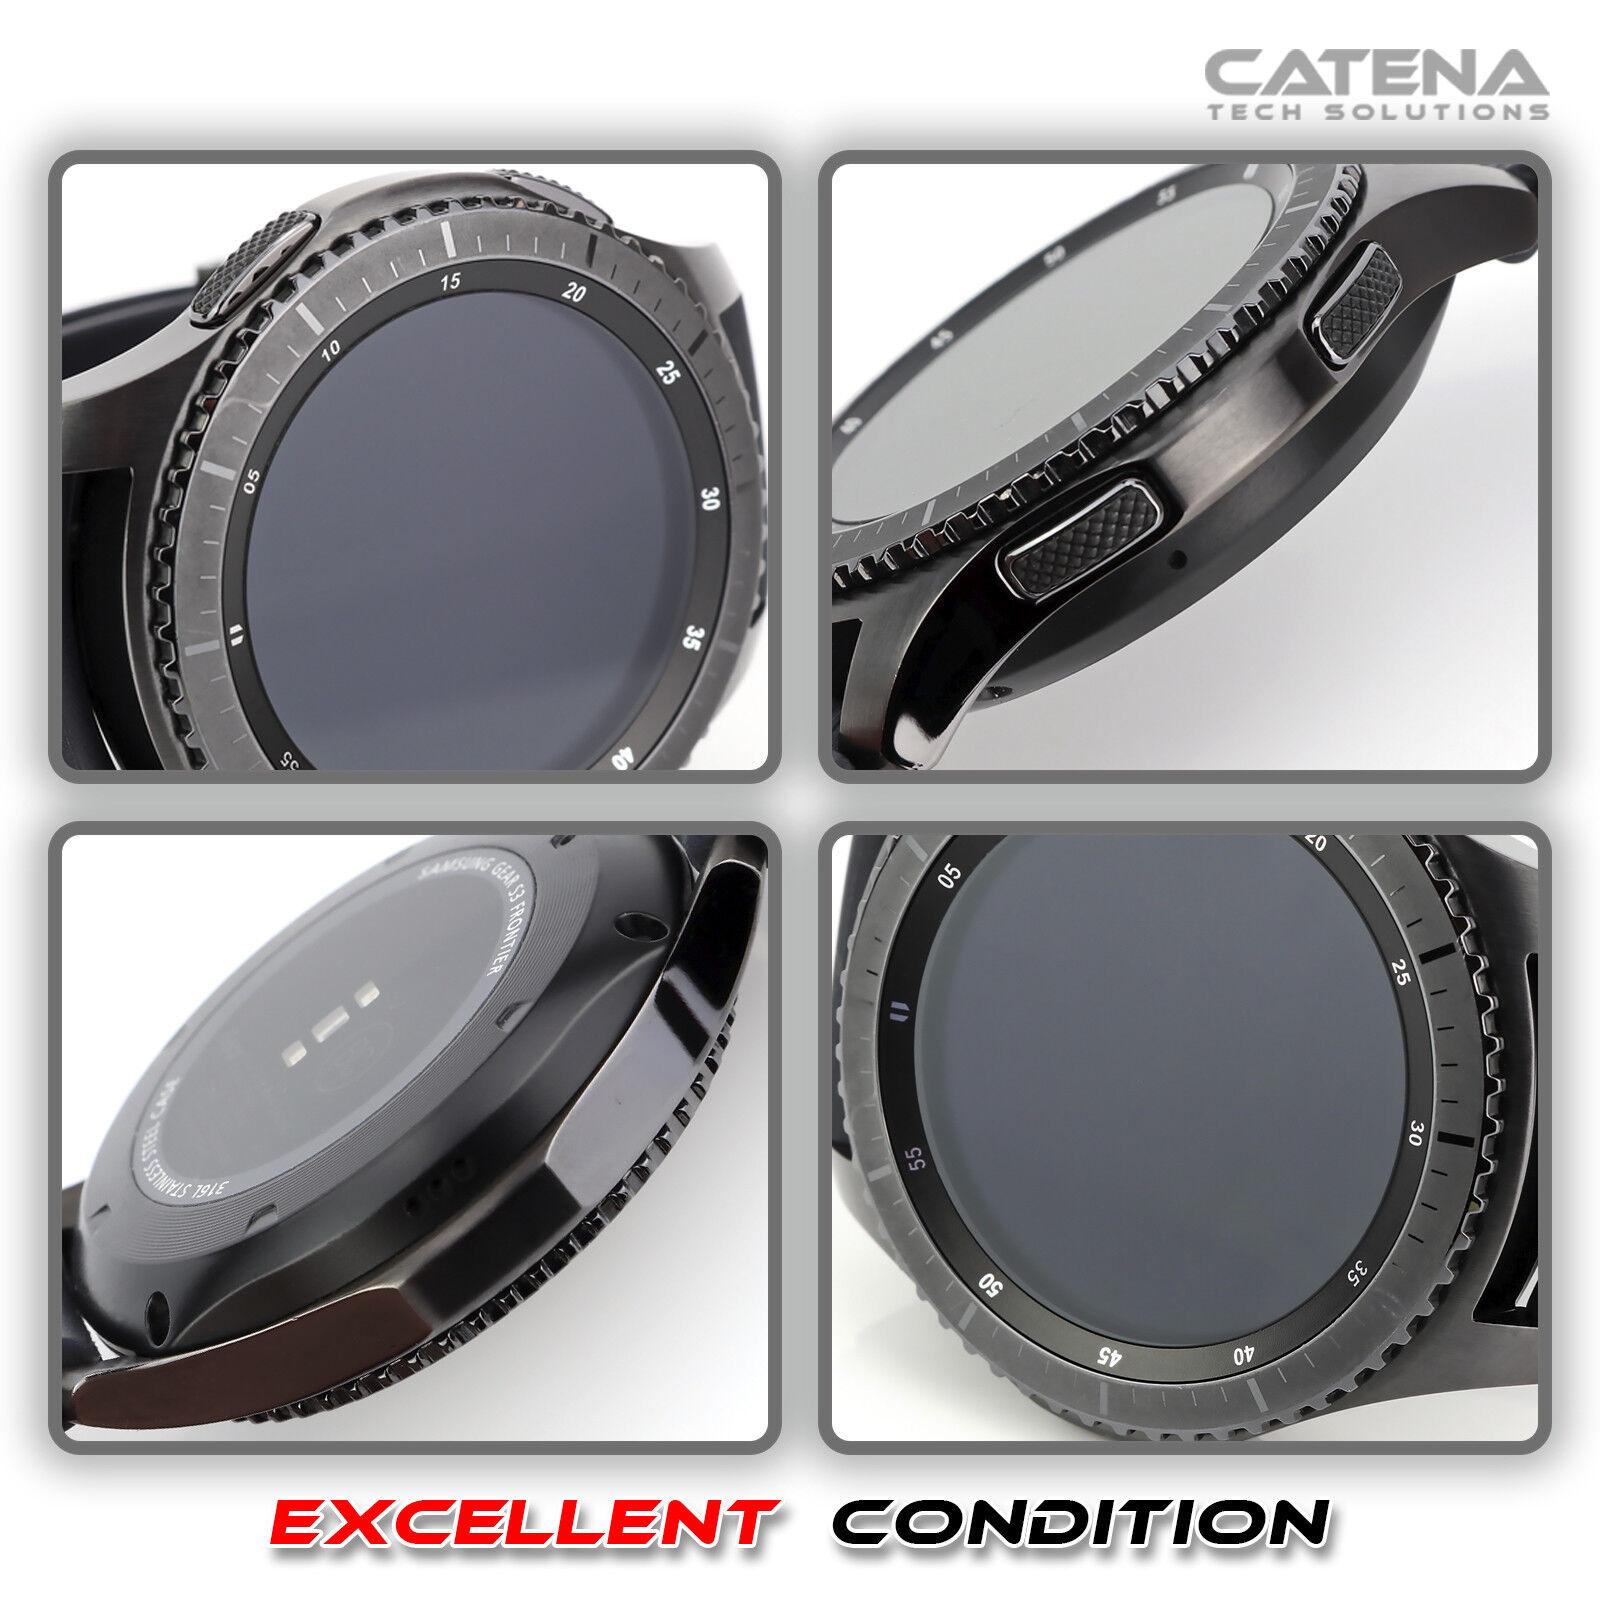 Samsung Gear S3 Frontier Smartwatch SM-R760 46mm WIFI Bluetooth SM-R760NDAAXAR